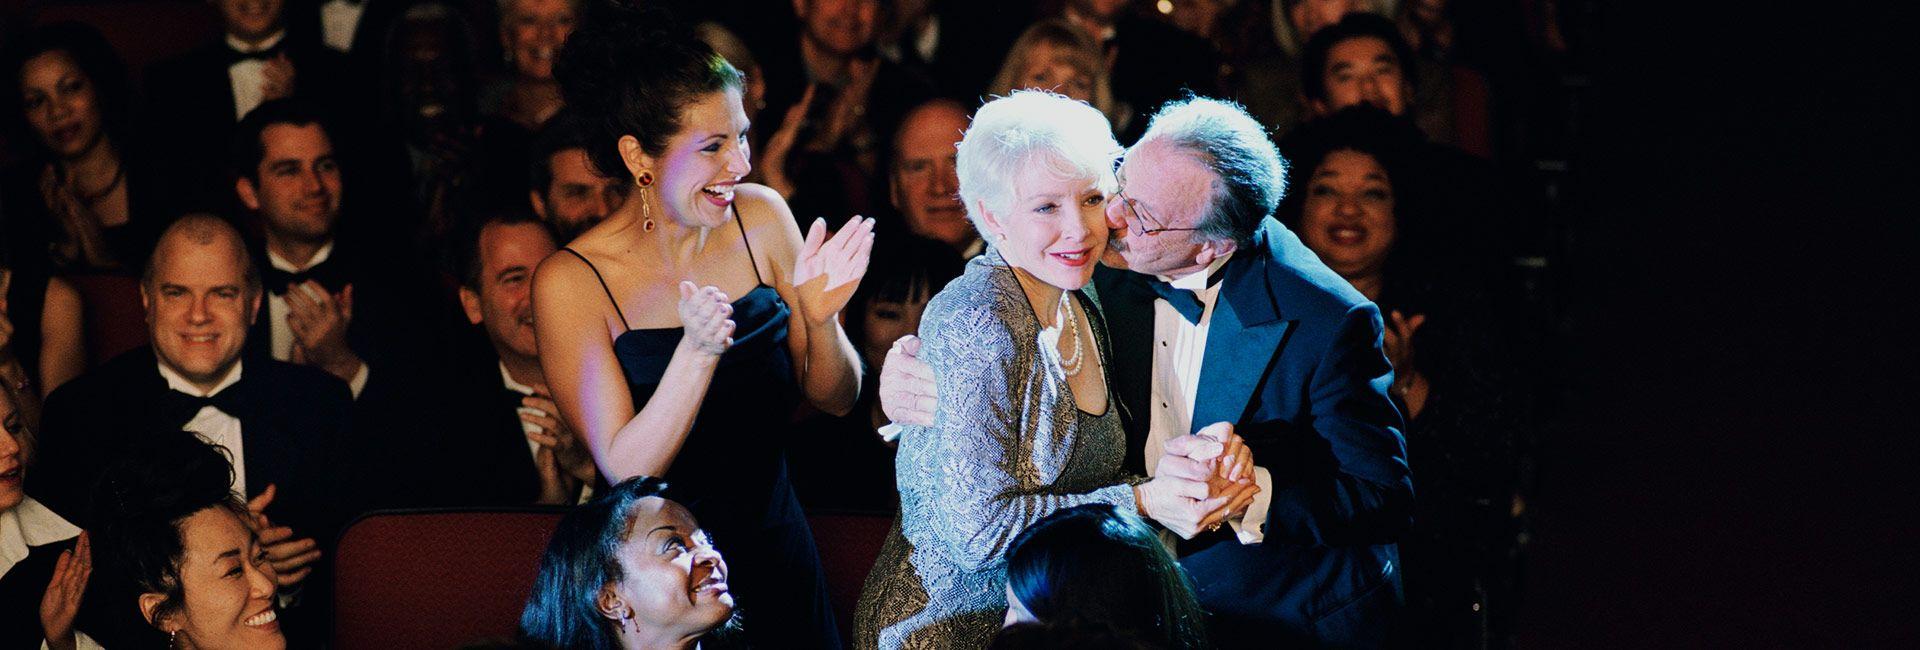 hollywood awards evening